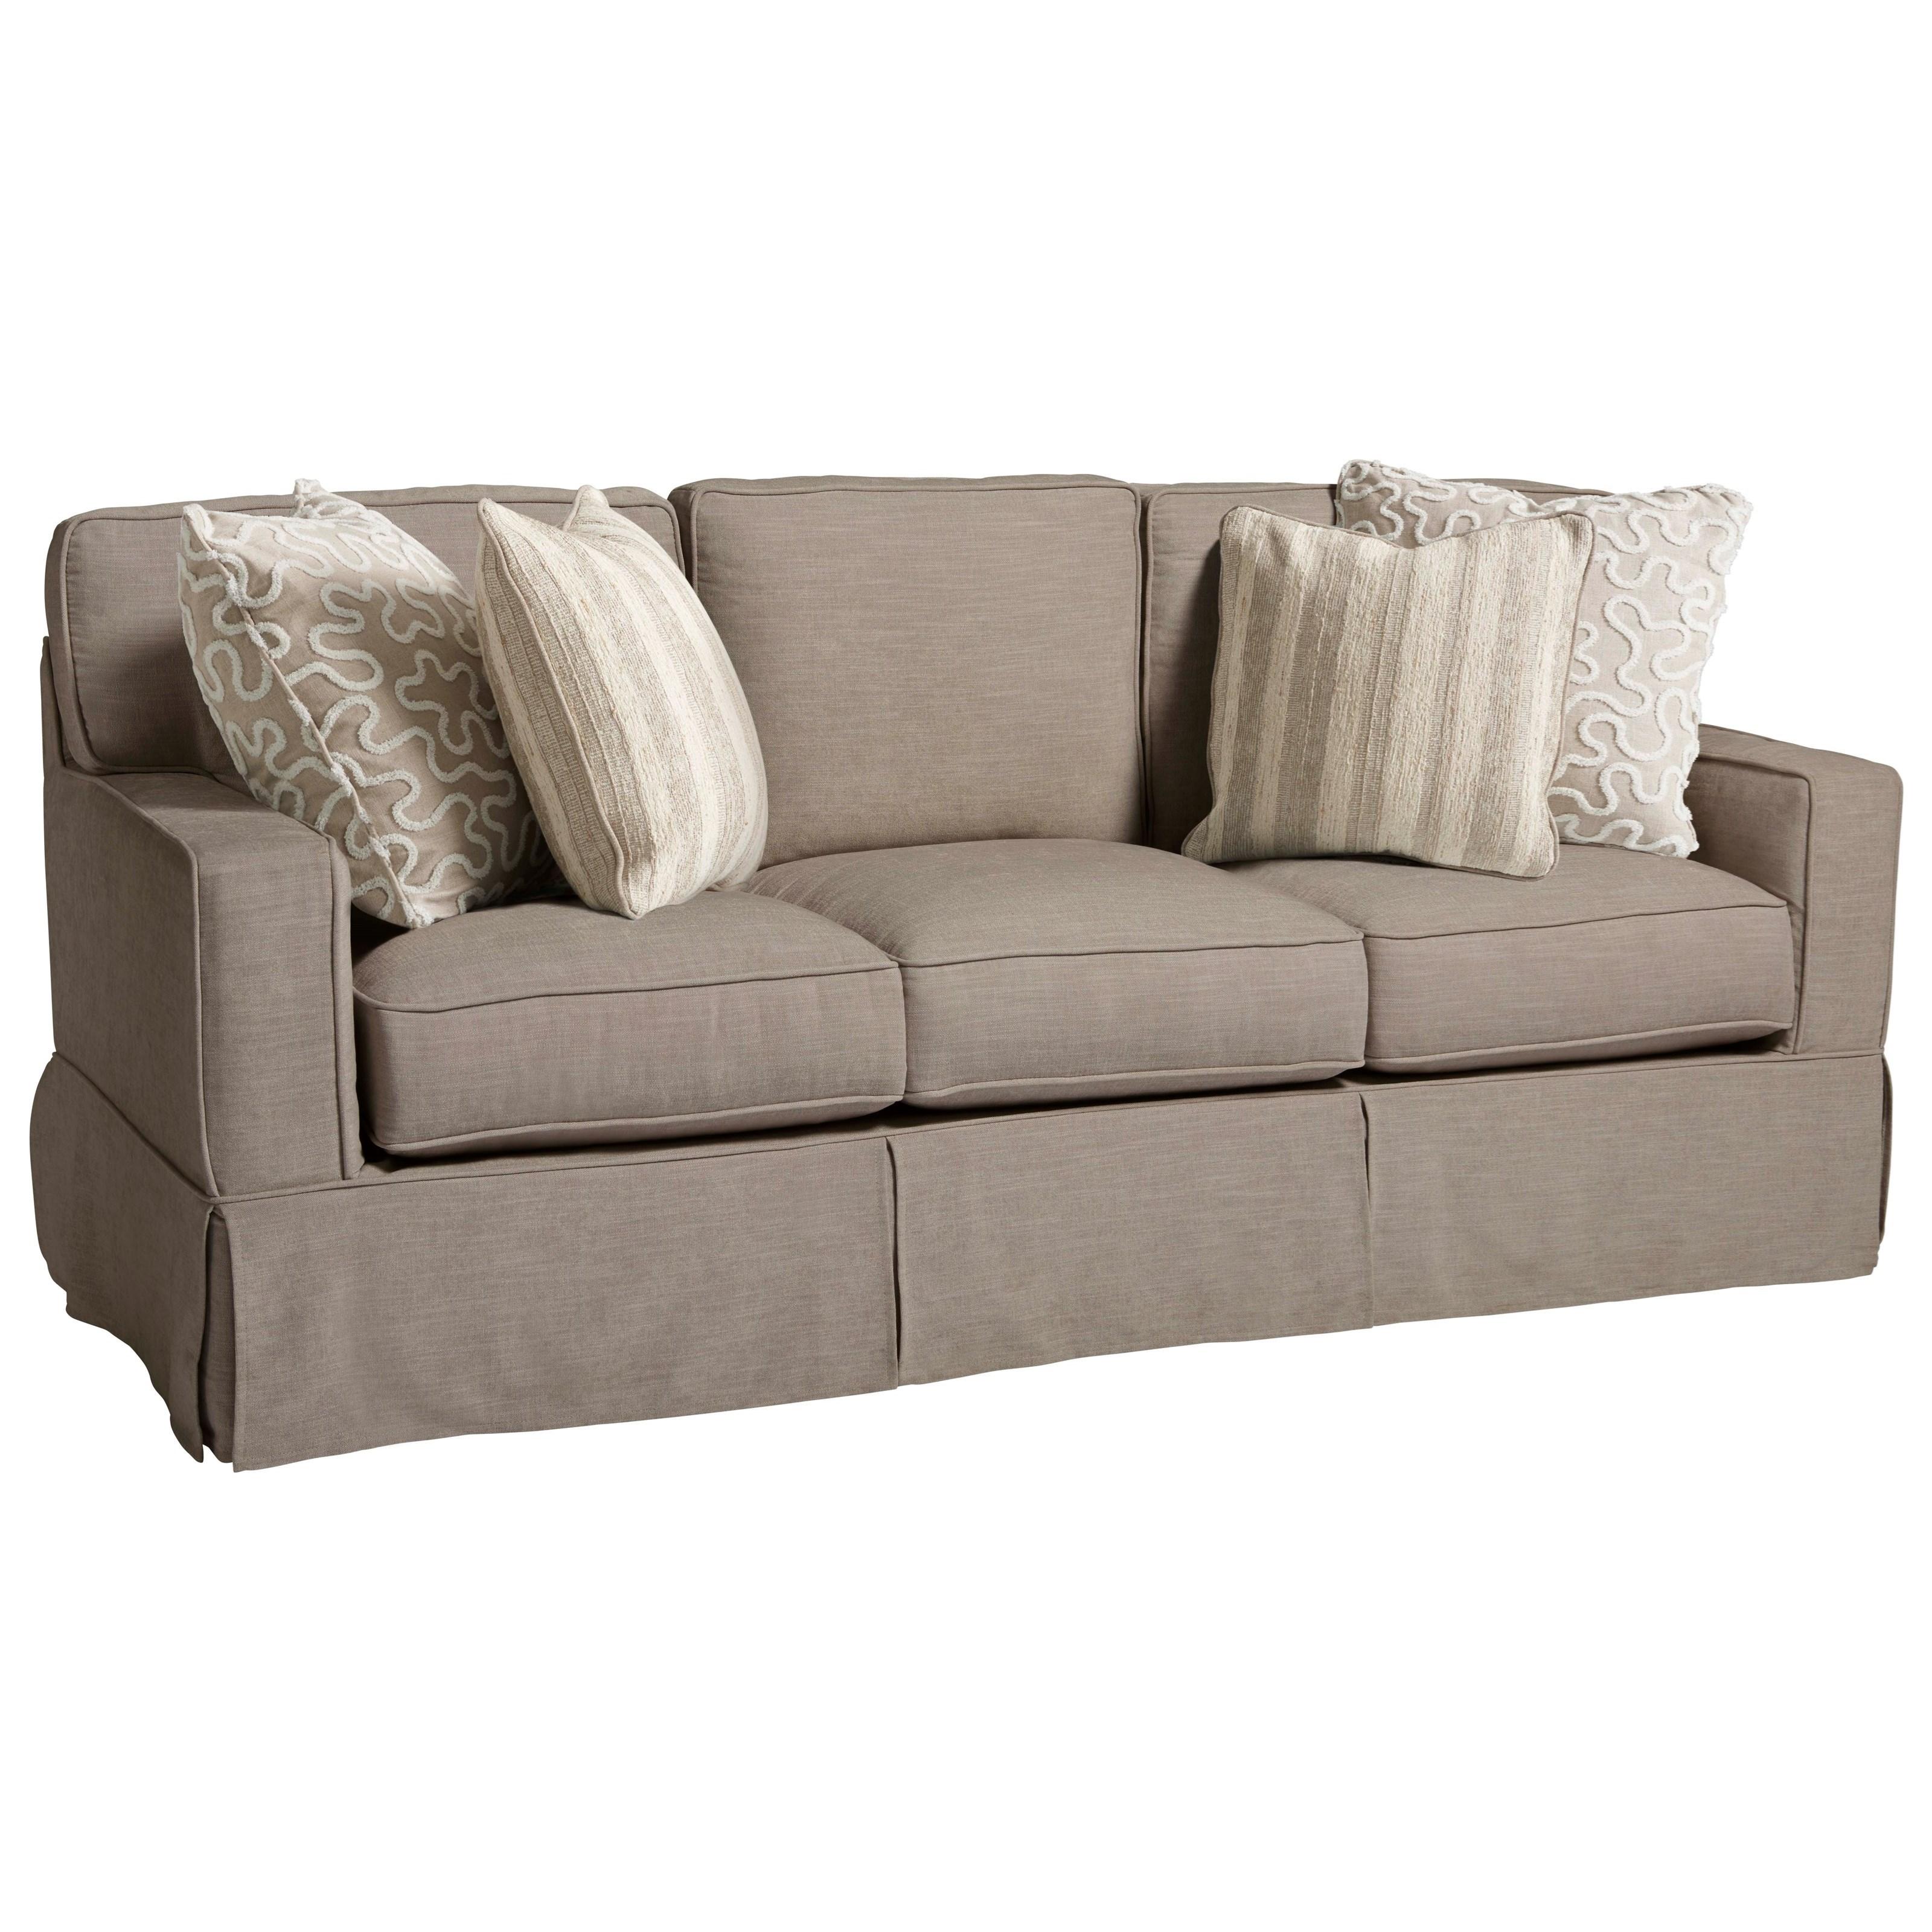 Coastal Living Home - Escape Chatham Sofa by Universal at Zak's Home